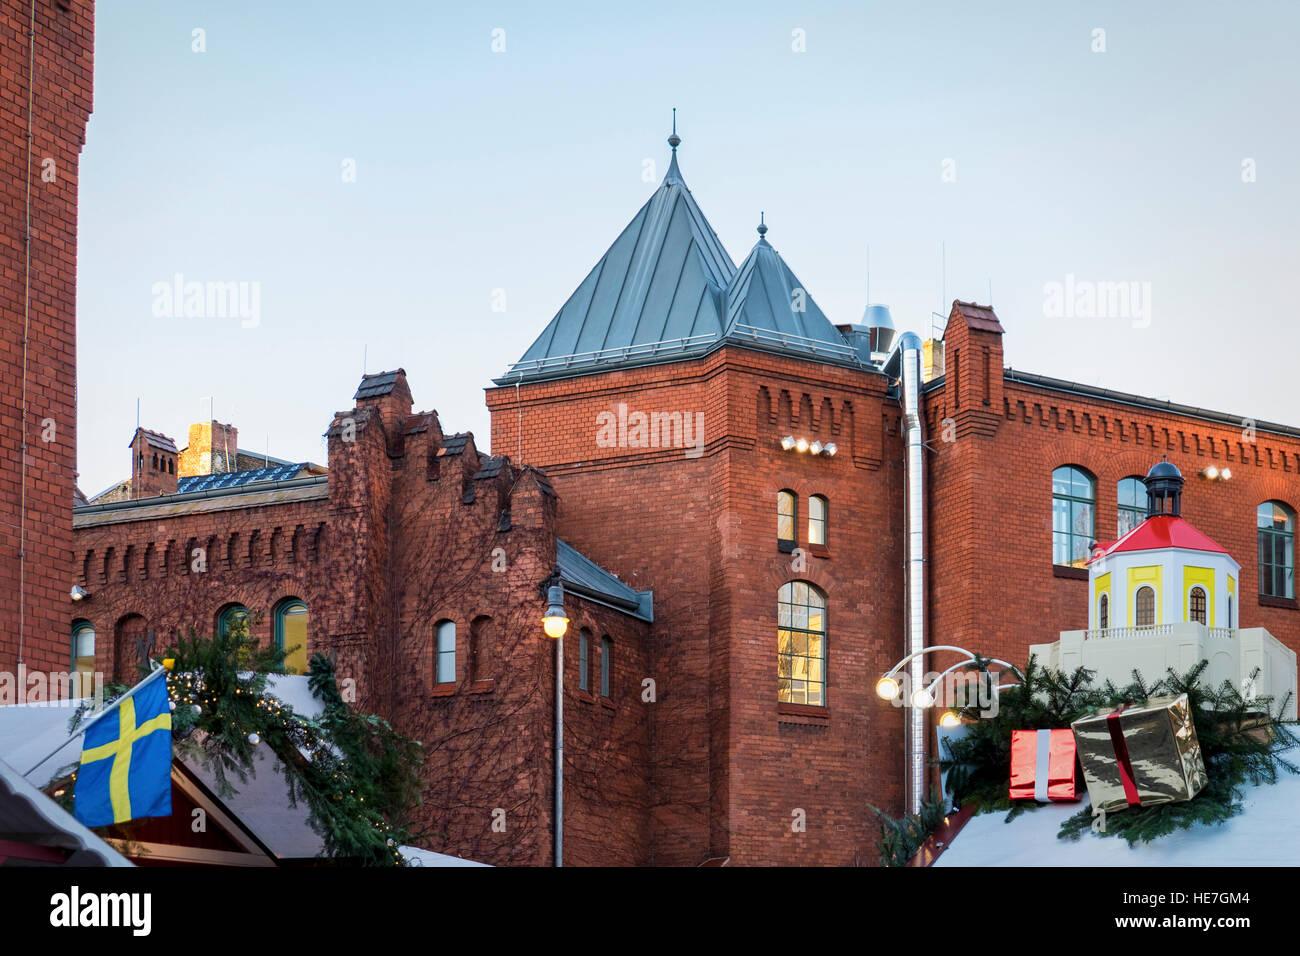 berlin christmas market stalls at old brewery german. Black Bedroom Furniture Sets. Home Design Ideas